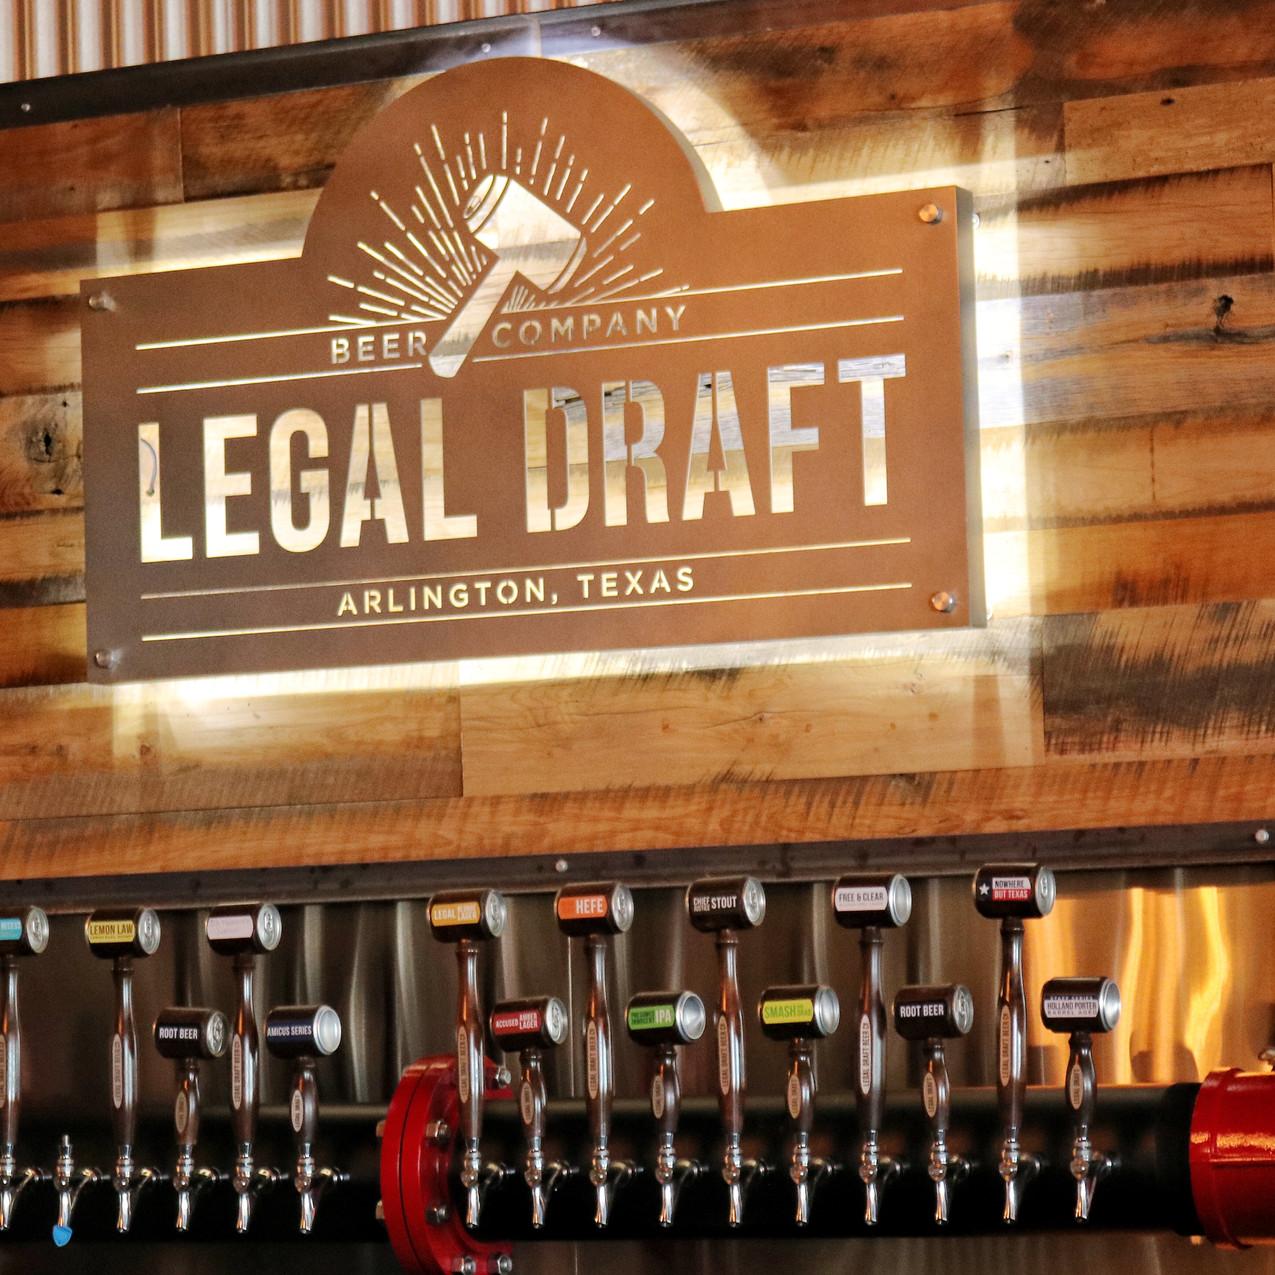 Legal Draft Brewing